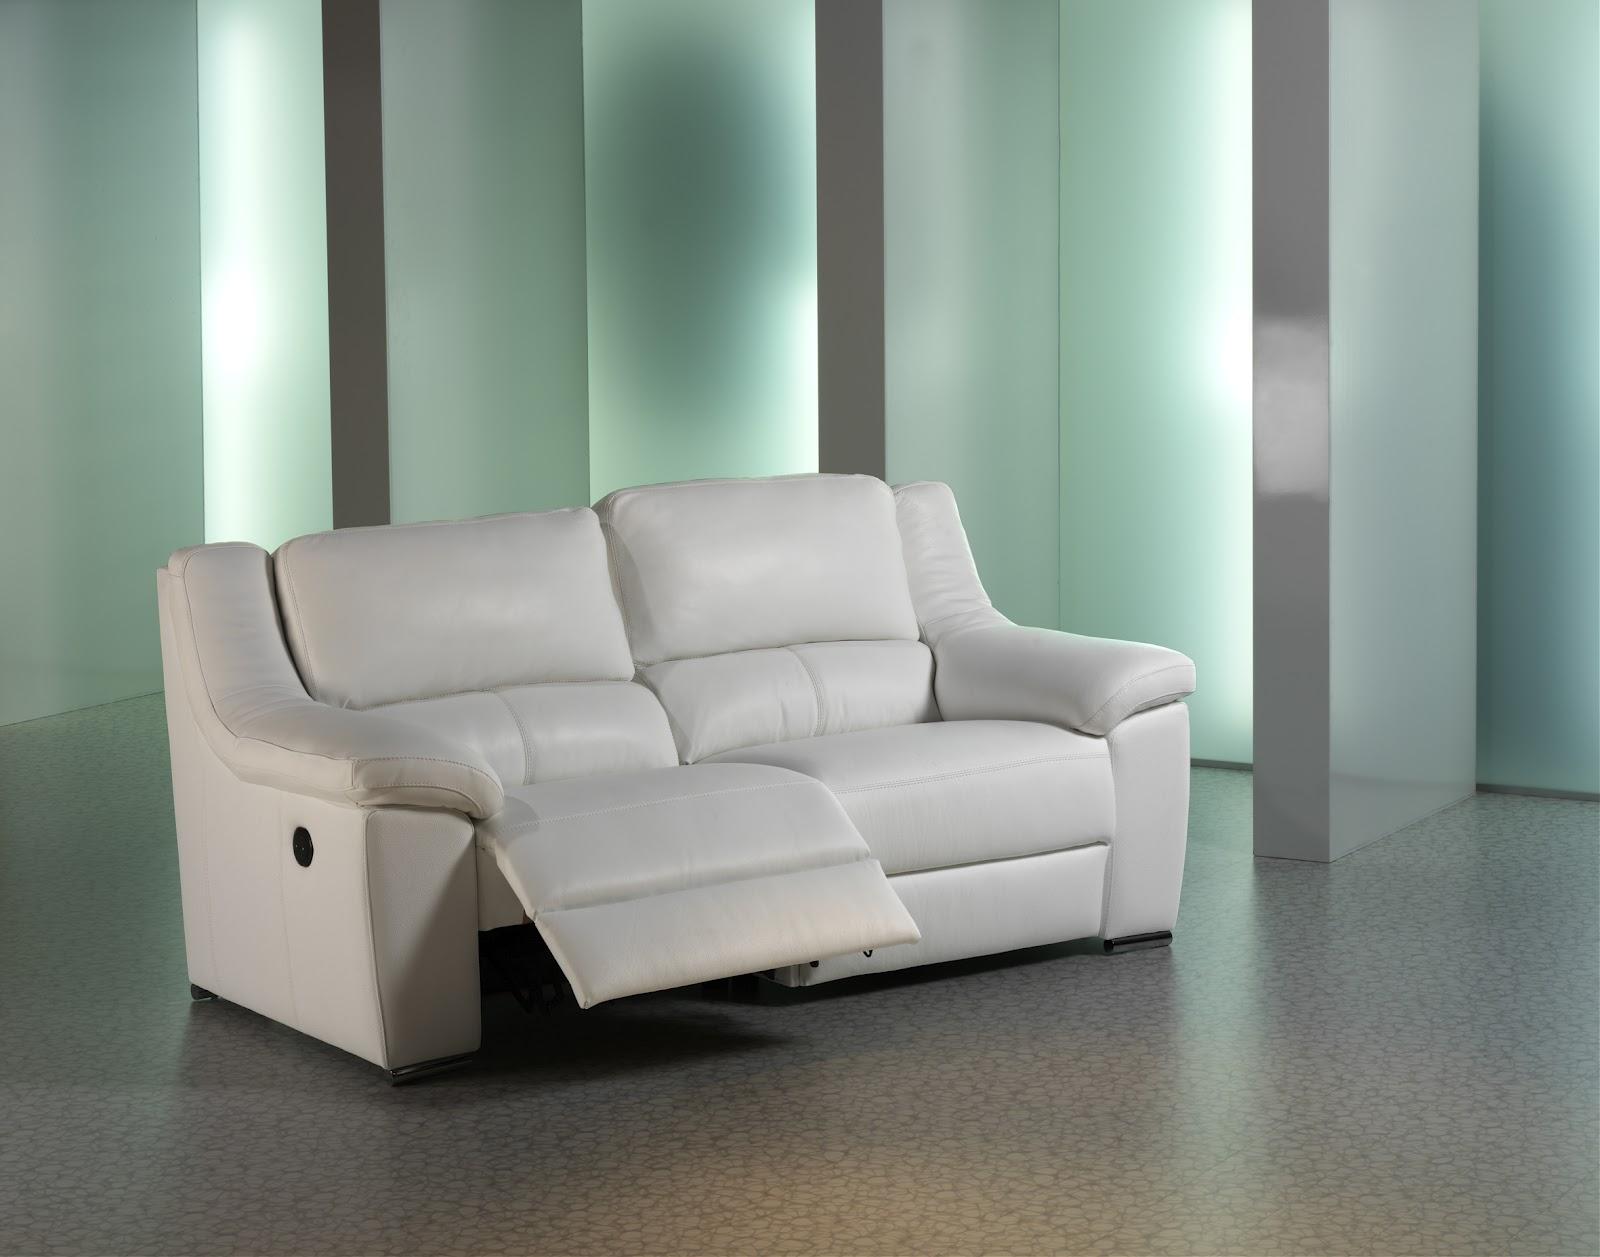 fabrica sofas piel yecla